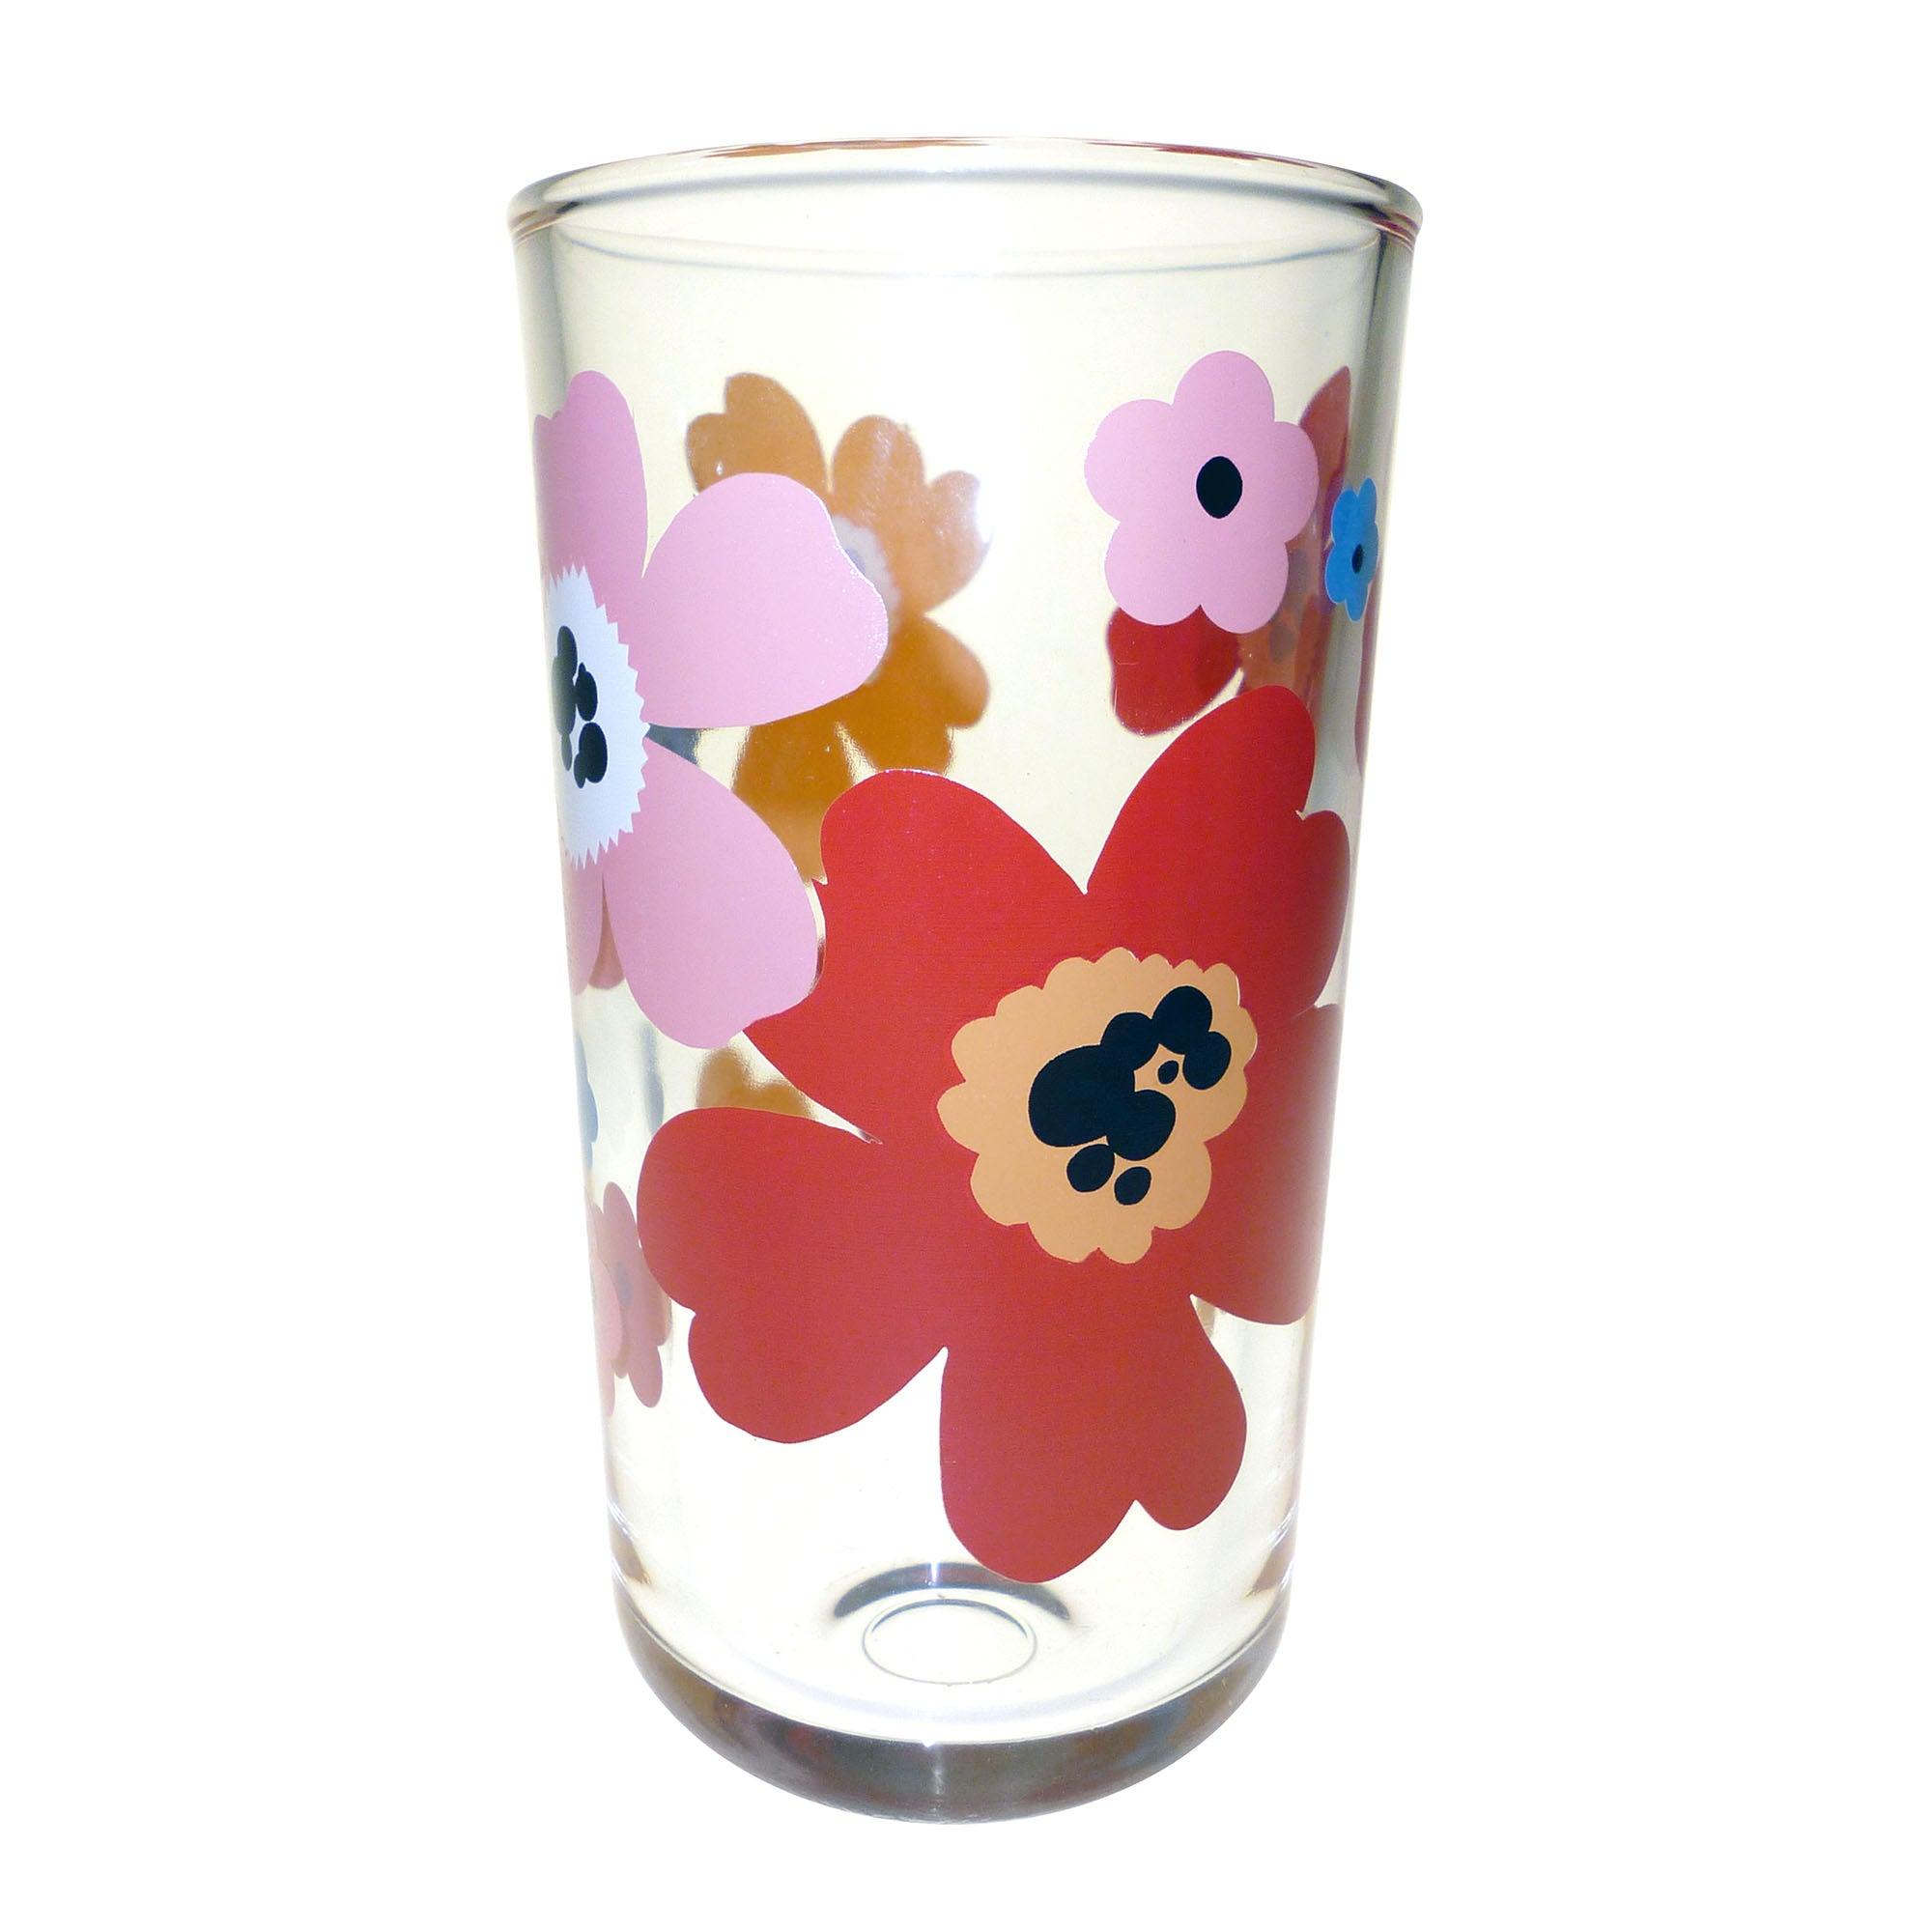 Aster Glass Highball Floral